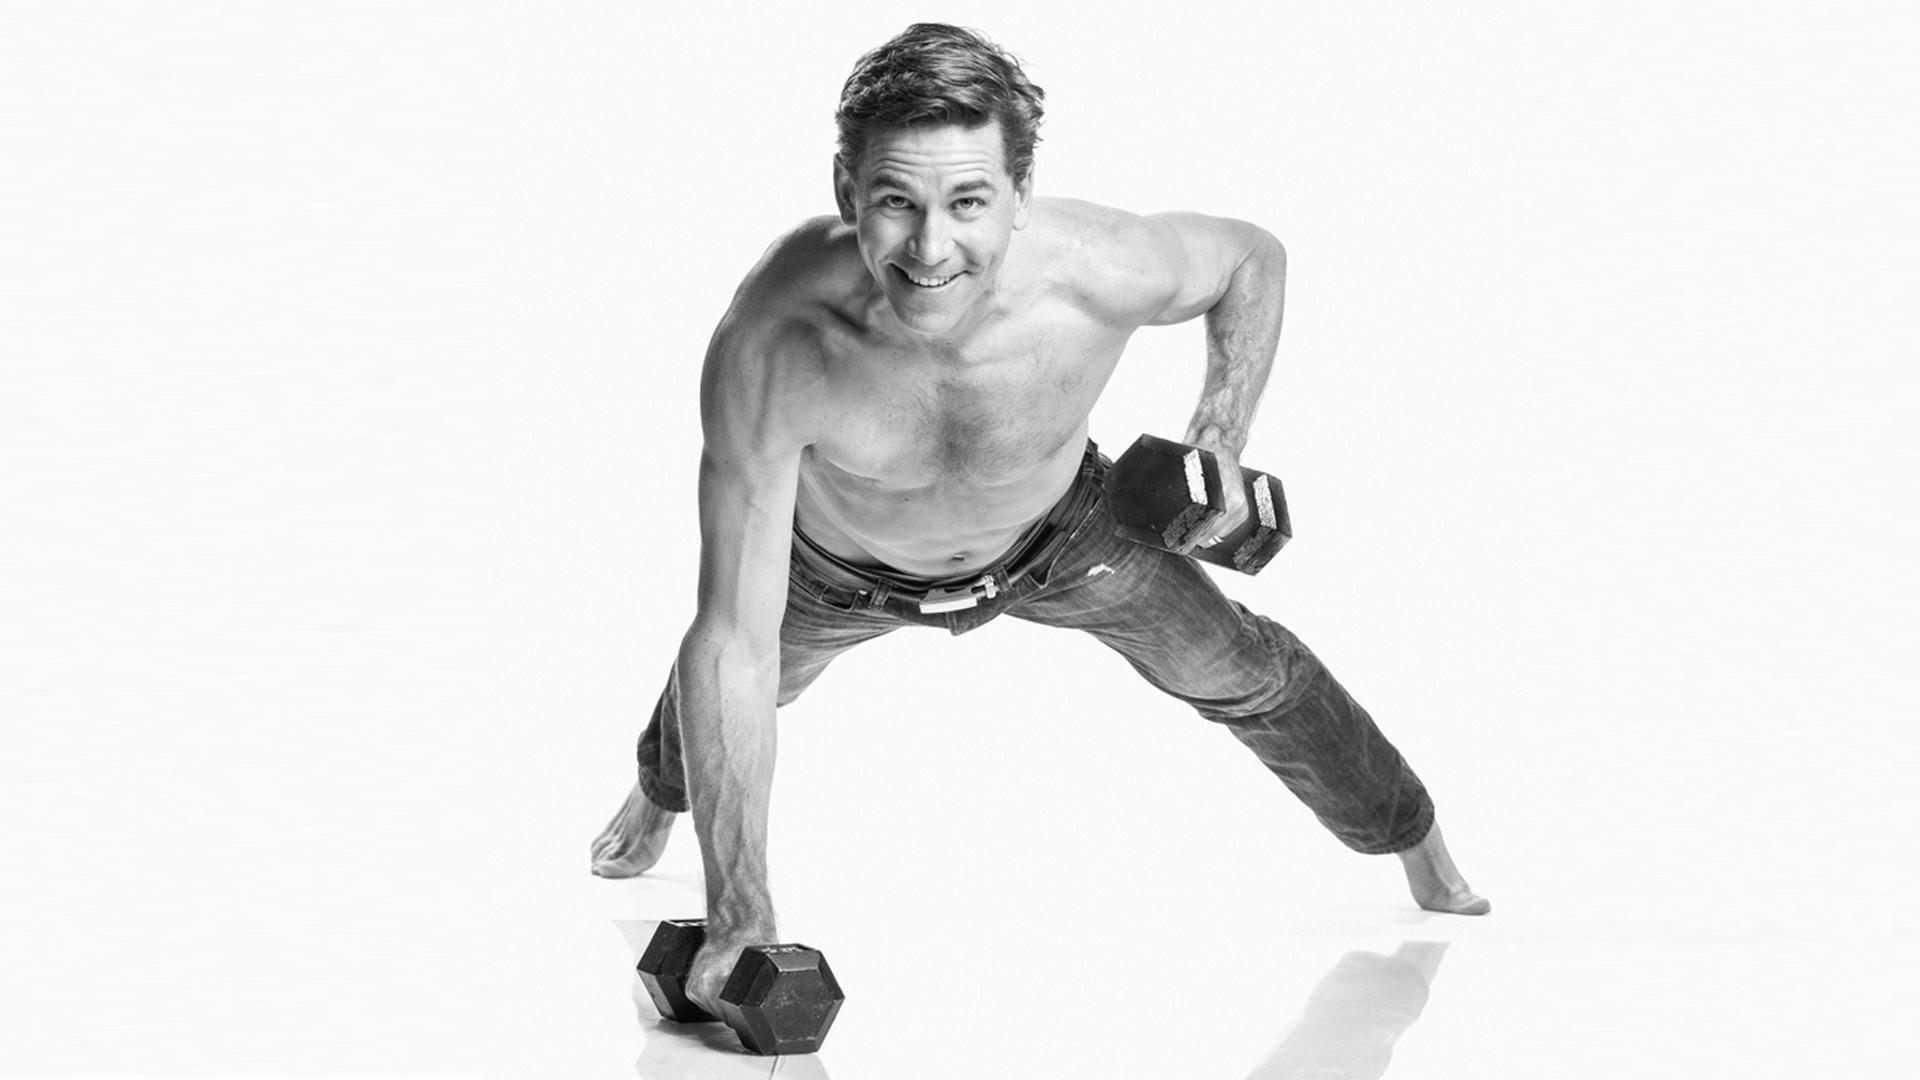 NCIS star Brian Dietzen has a strong stomach